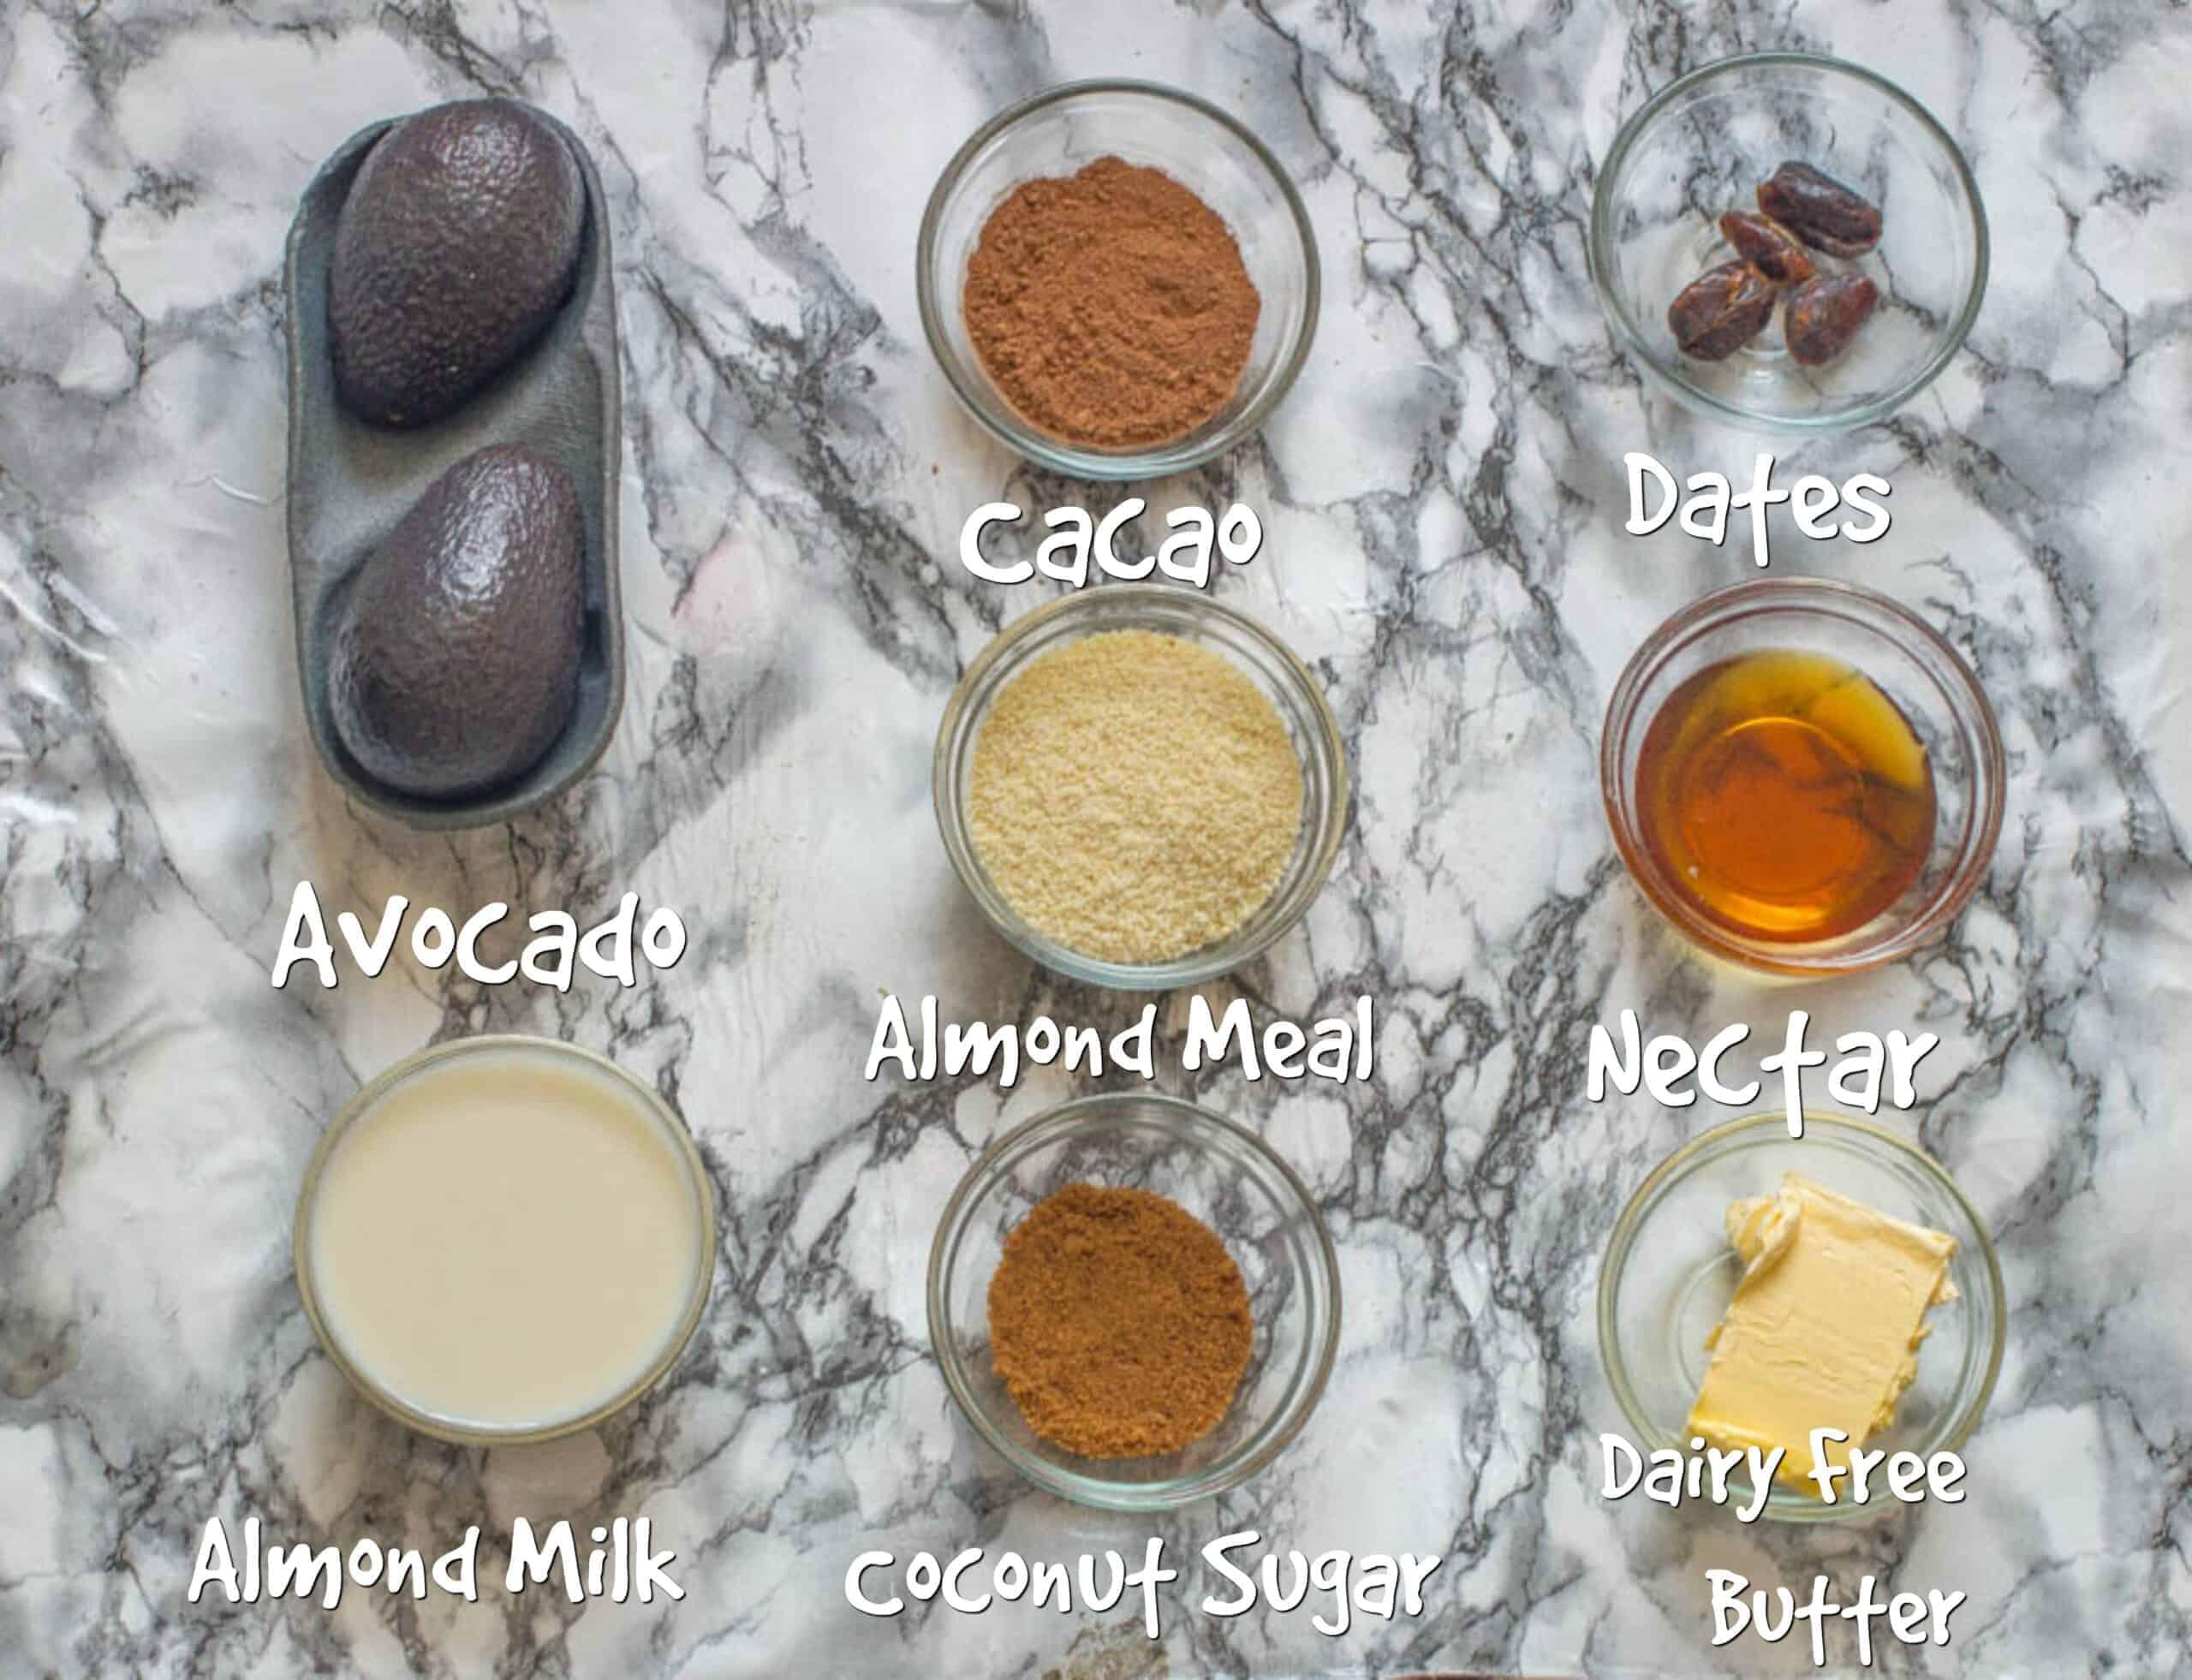 avocado chocolate crumble ingredients